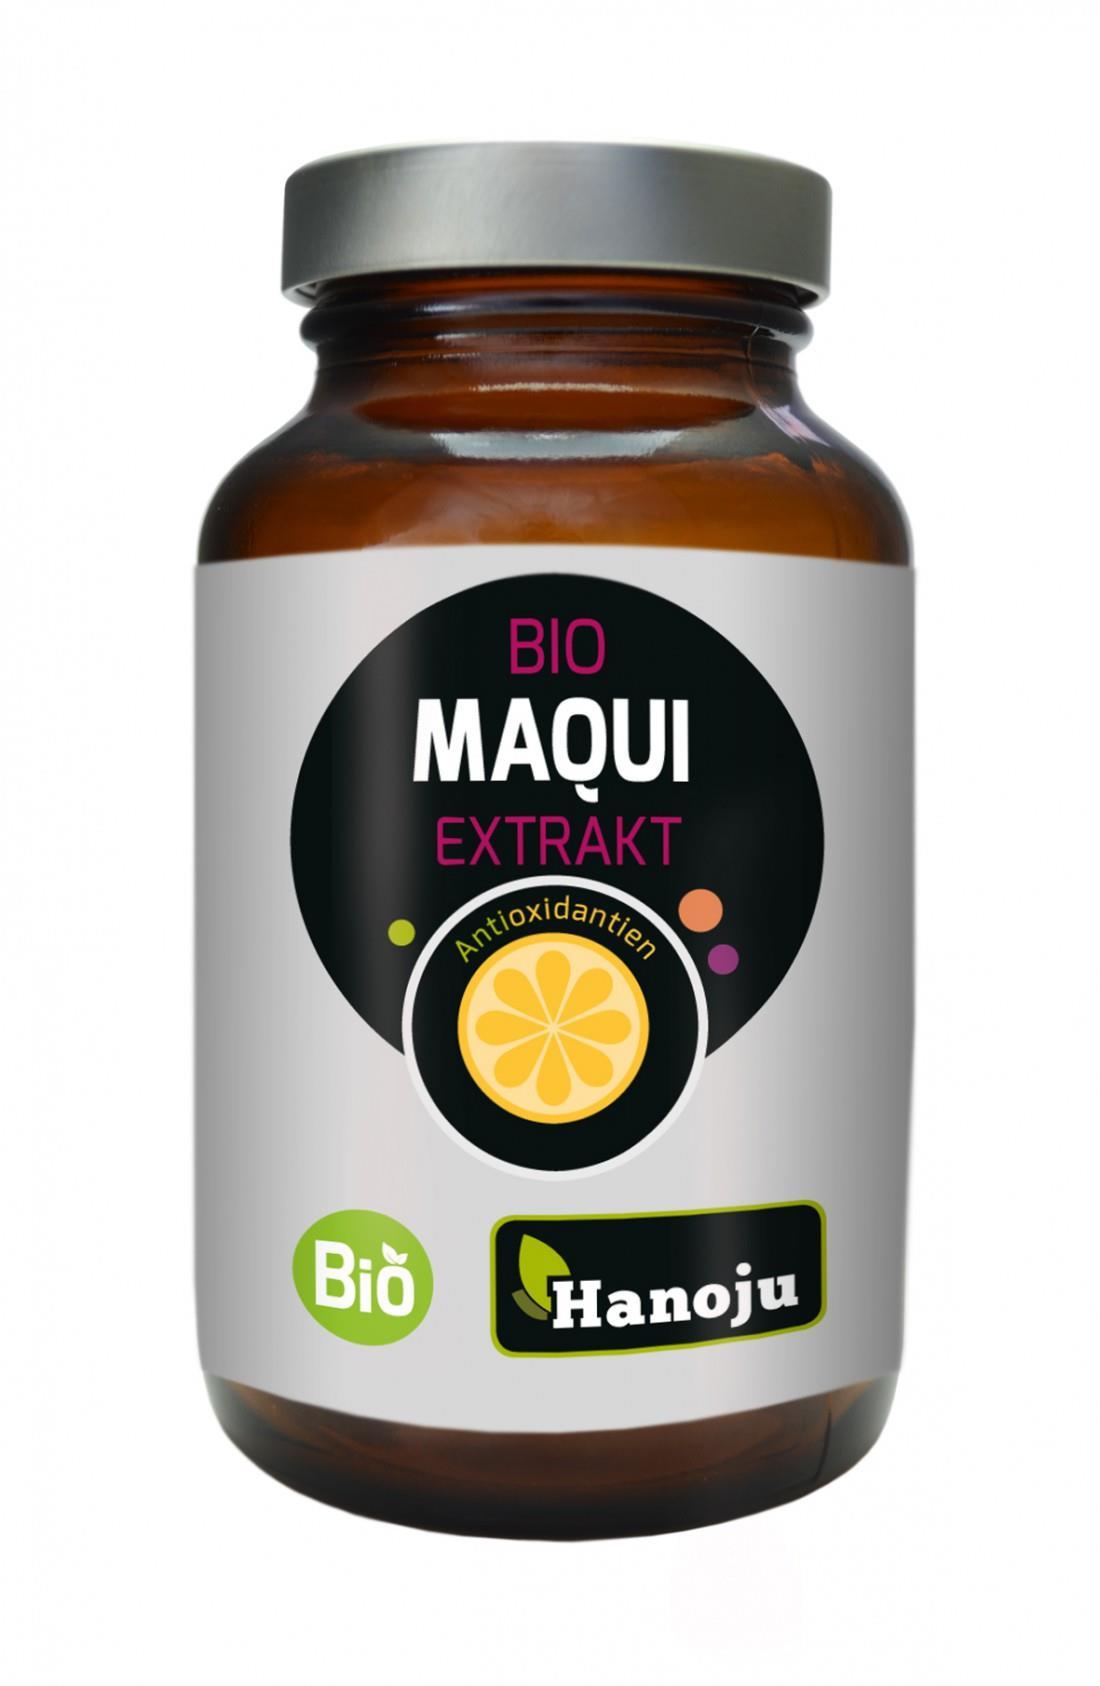 Bio Maqui Extrakt Kapseln Hanoju